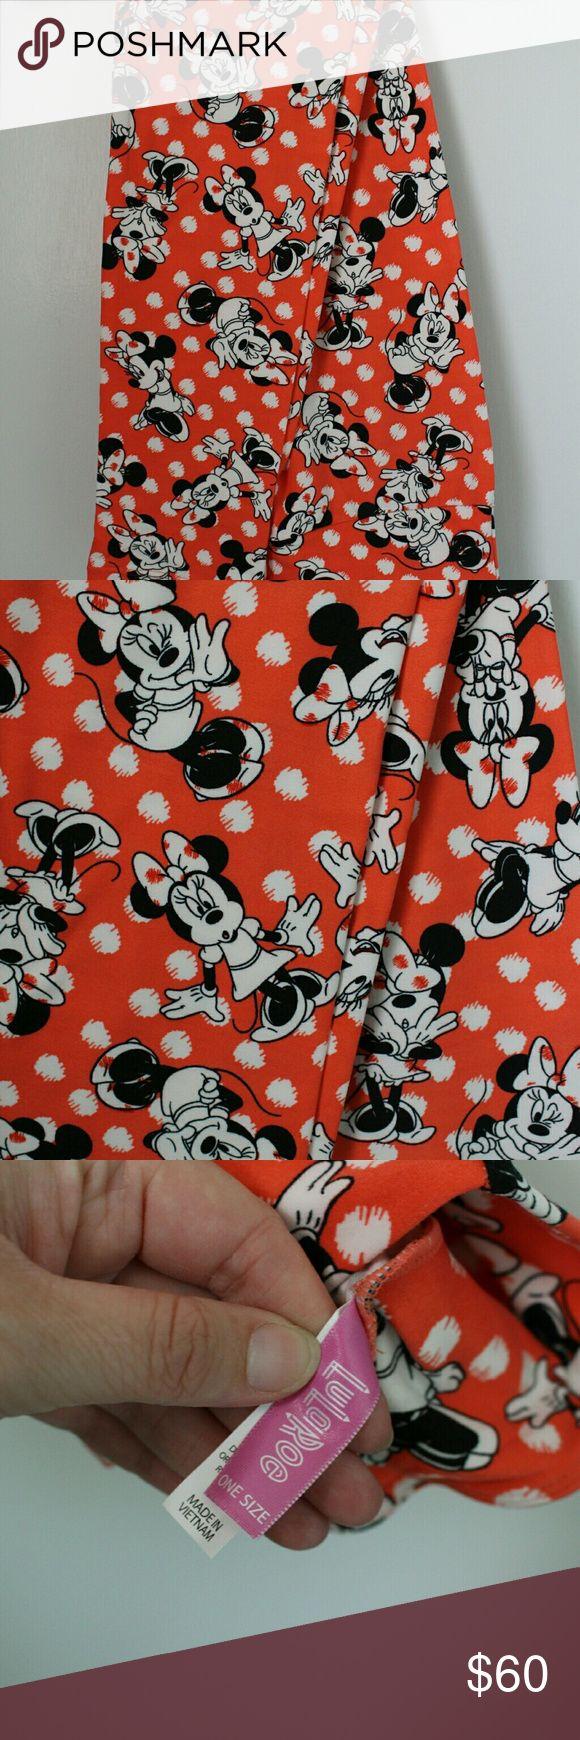 Lularoe OS Disney Minnie Mouse Polka dot leggings Brand new amazing Disney leggings!! Orange background with white dots. Cute facial expressions on each Minnie. LuLaRoe Pants Leggings